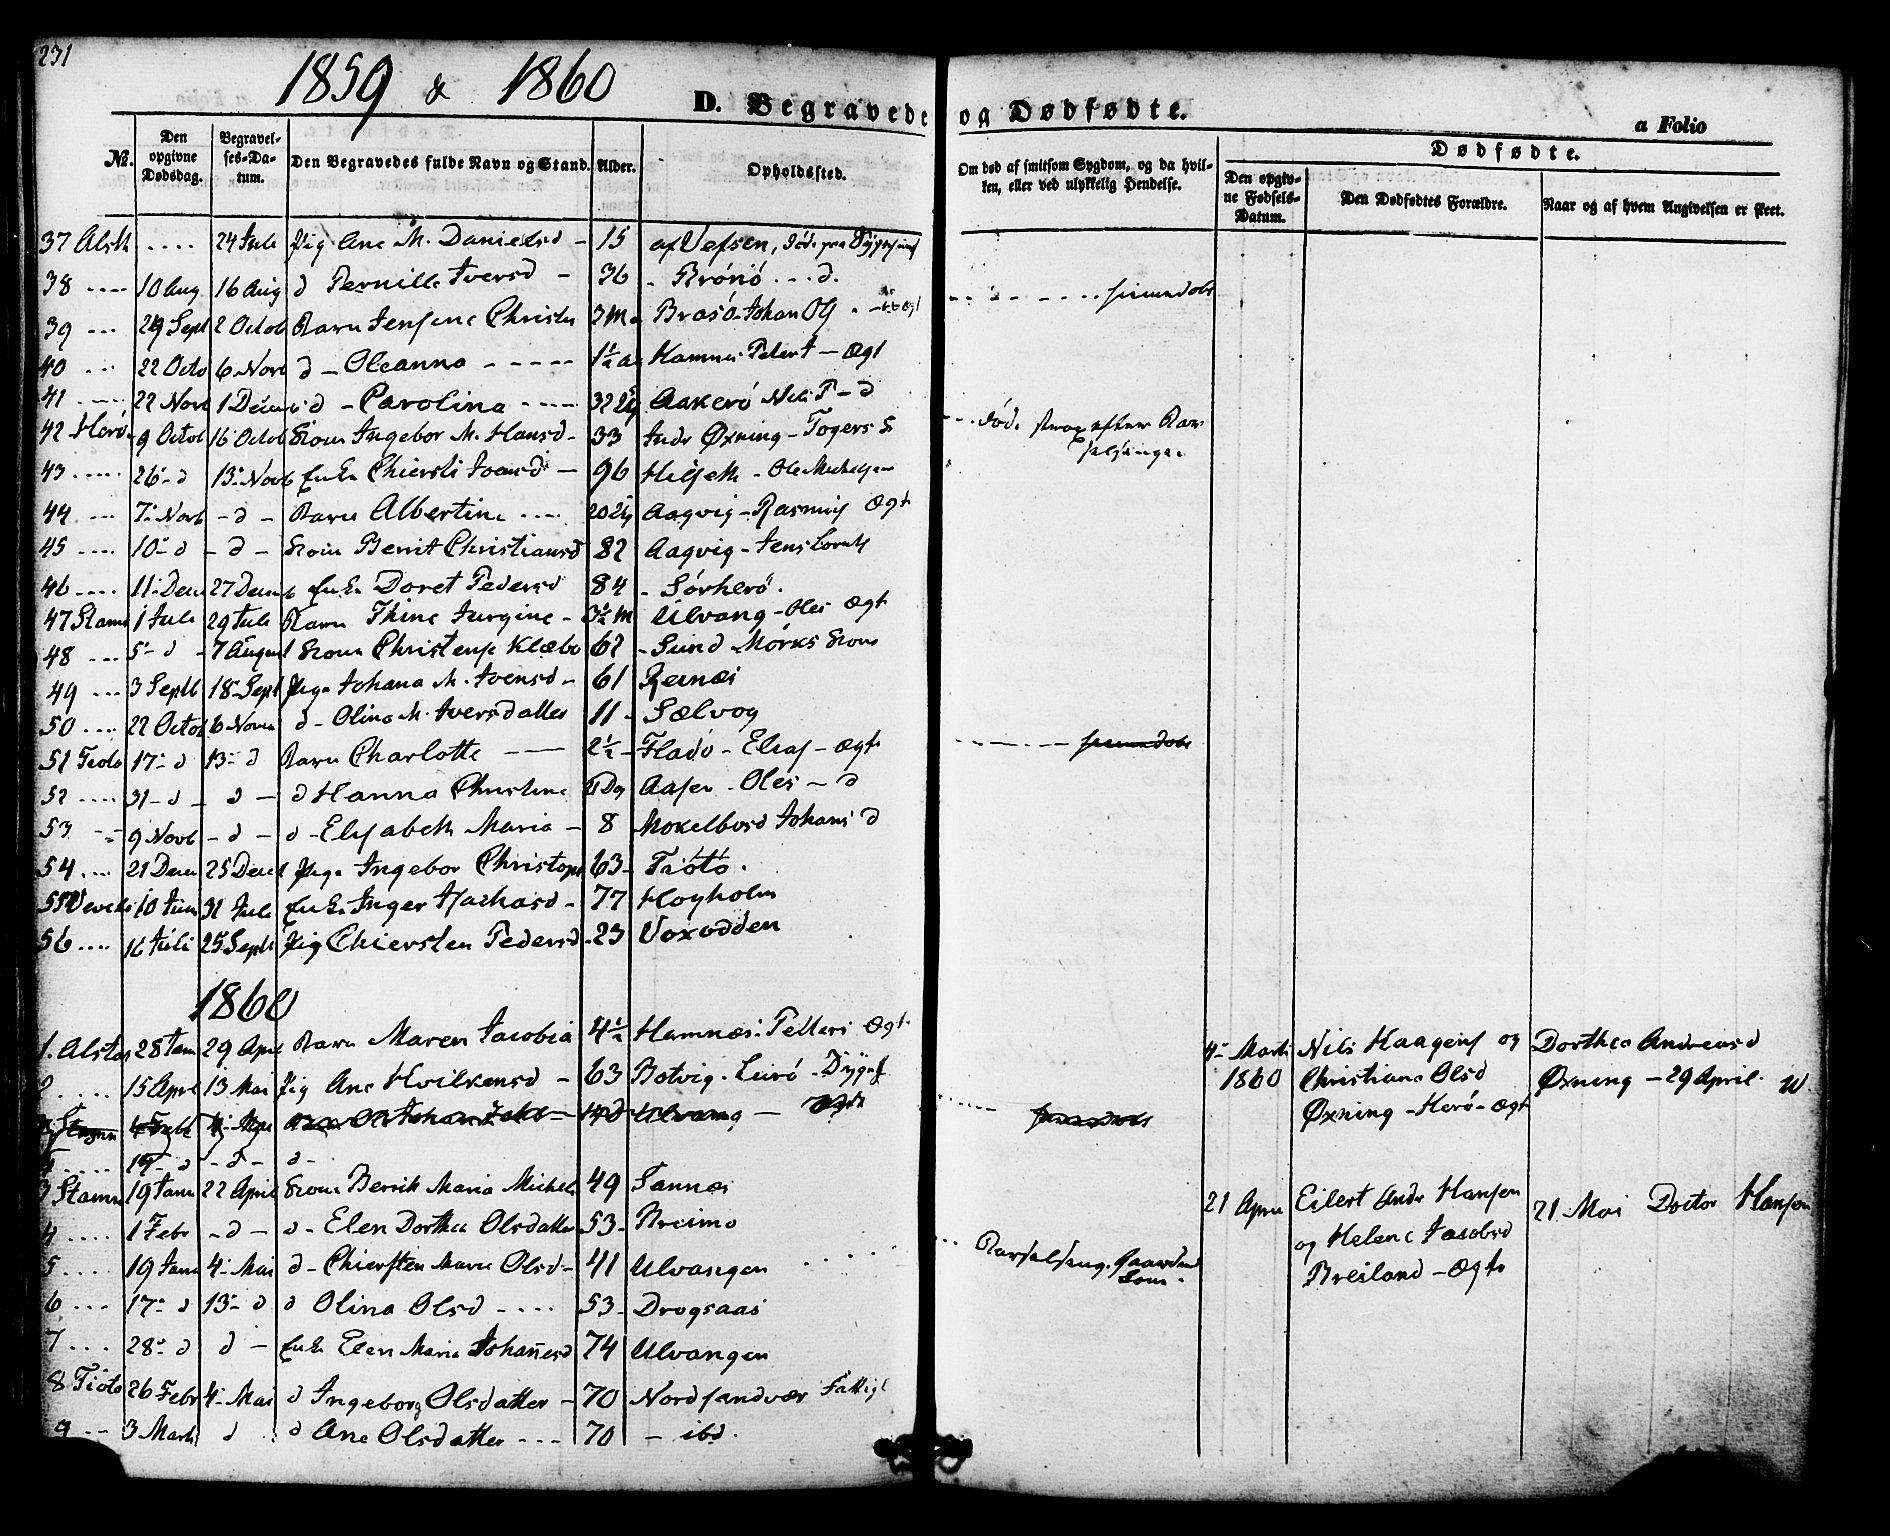 SAT, Ministerialprotokoller, klokkerbøker og fødselsregistre - Nordland, 830/L0448: Ministerialbok nr. 830A12, 1855-1878, s. 231